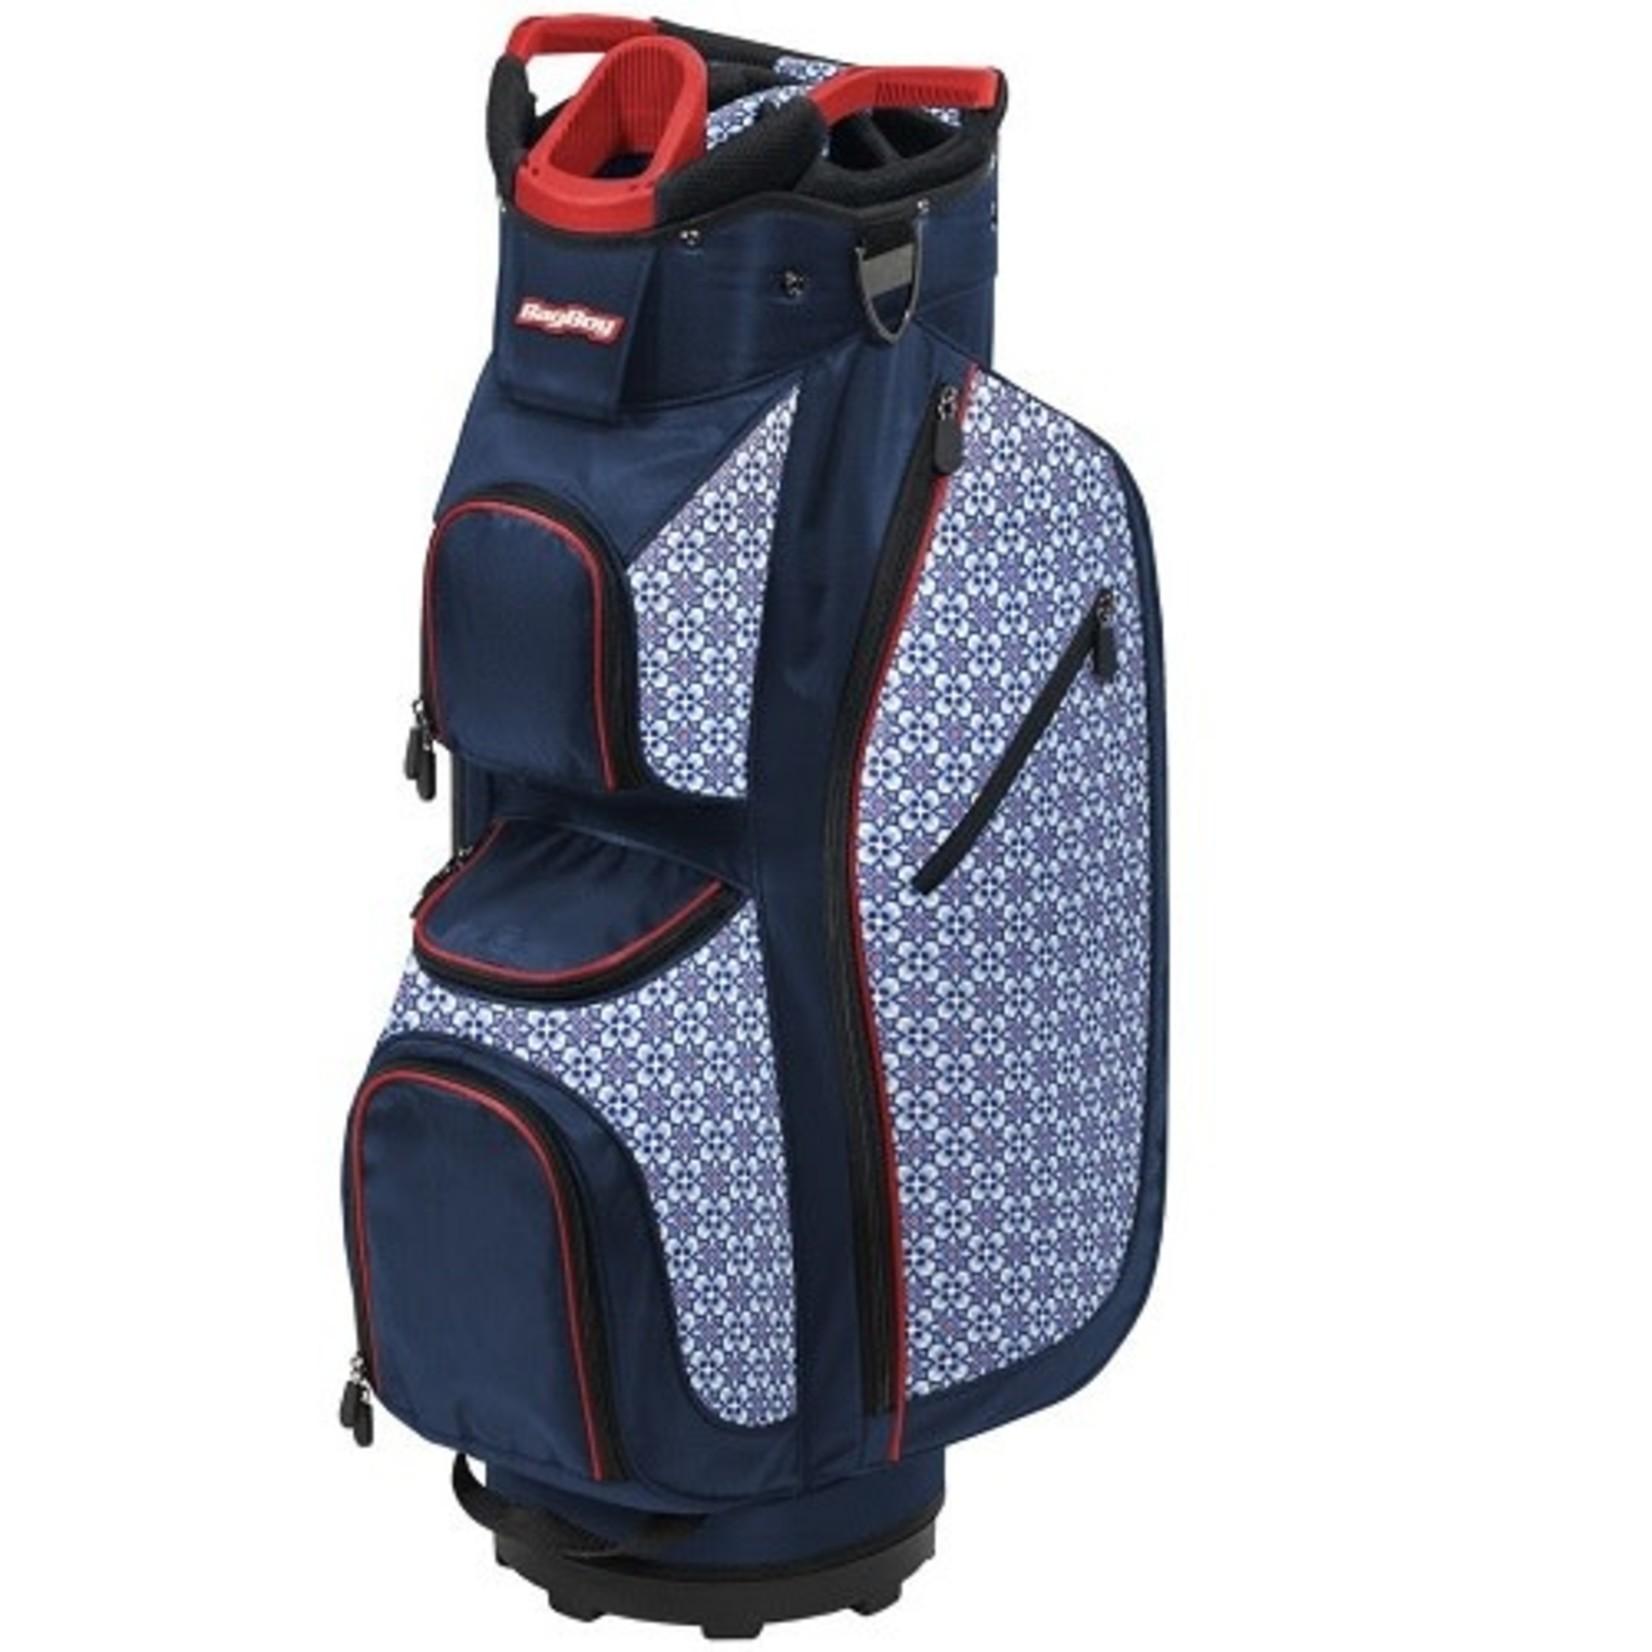 BagBoy Bagboy LDX Plus Cartbag Navy/Red/Blue Tiles